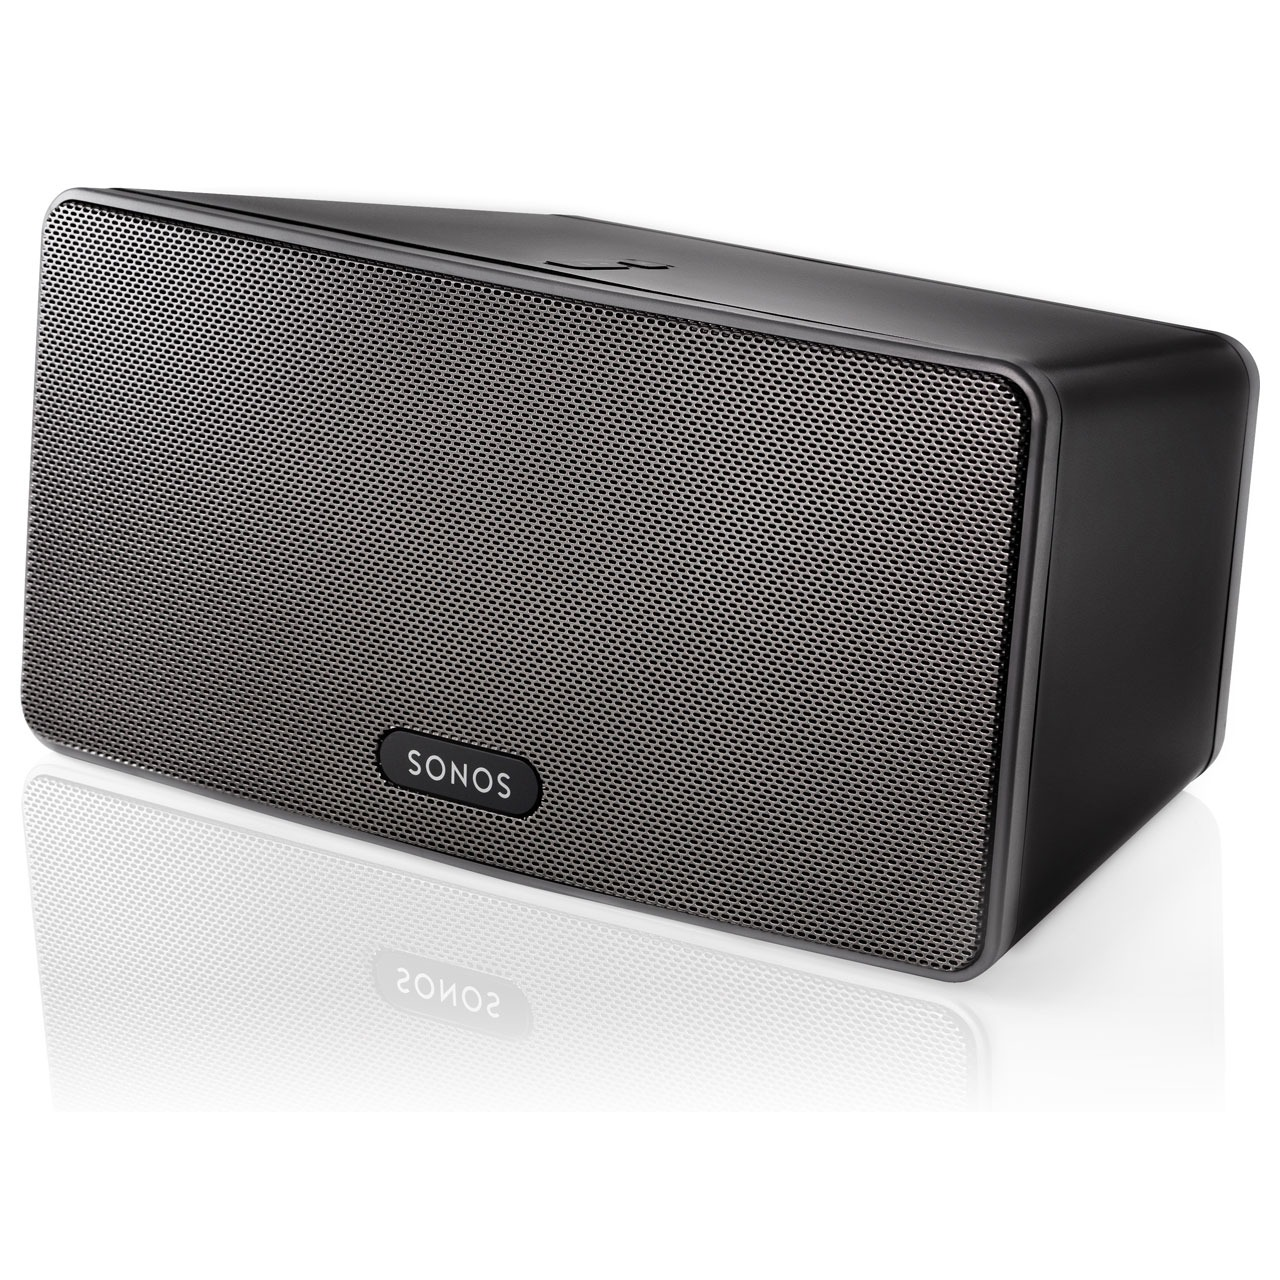 Serveur audio SONOS PLAY:3 Noir Enceinte multiroom sans fil